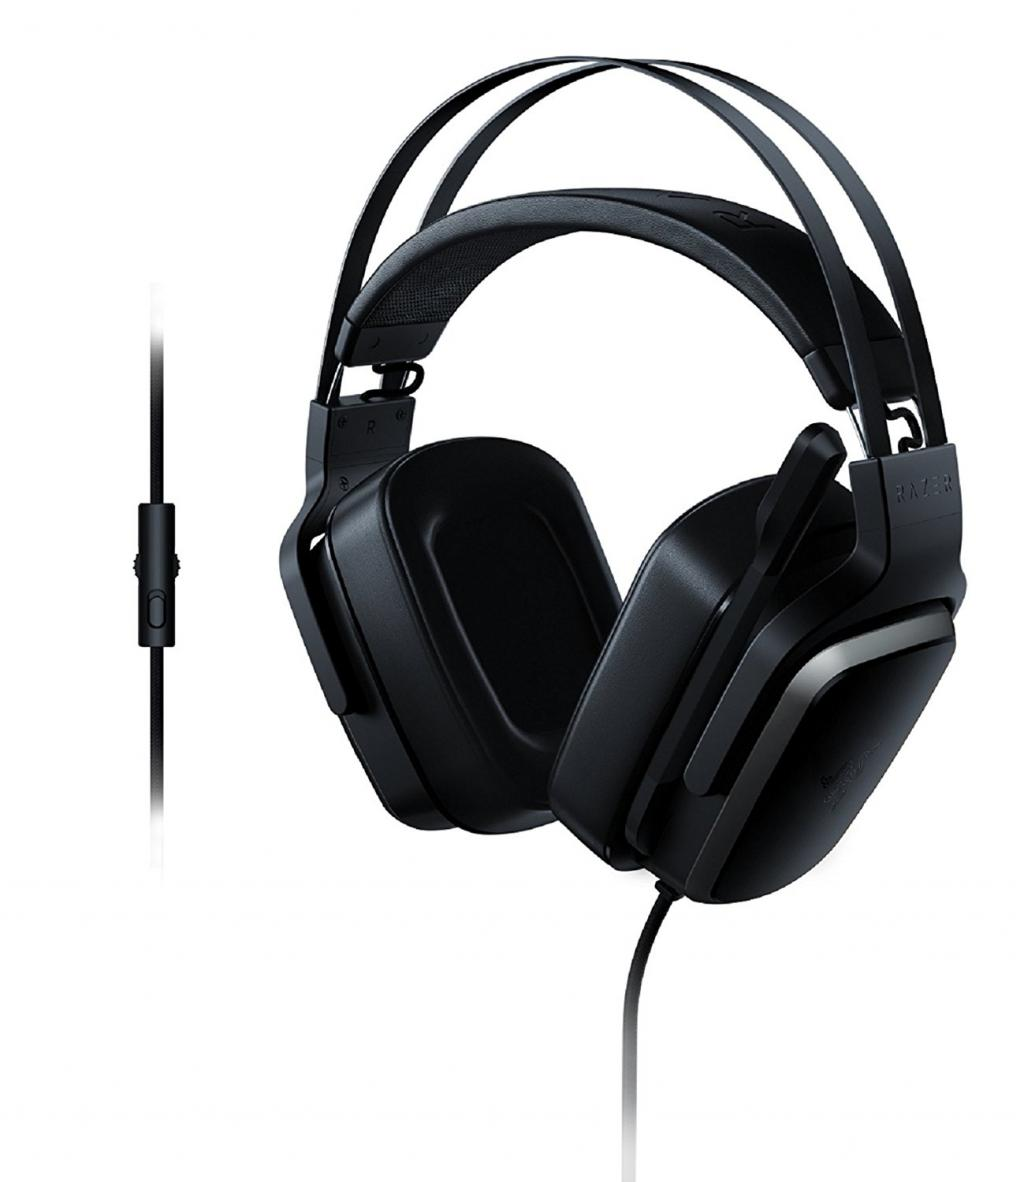 RAZER - Tiamat 2.2 V2 Gaming Headset (PC/PS4/XBONE MAC/XBONE/MOBILE)